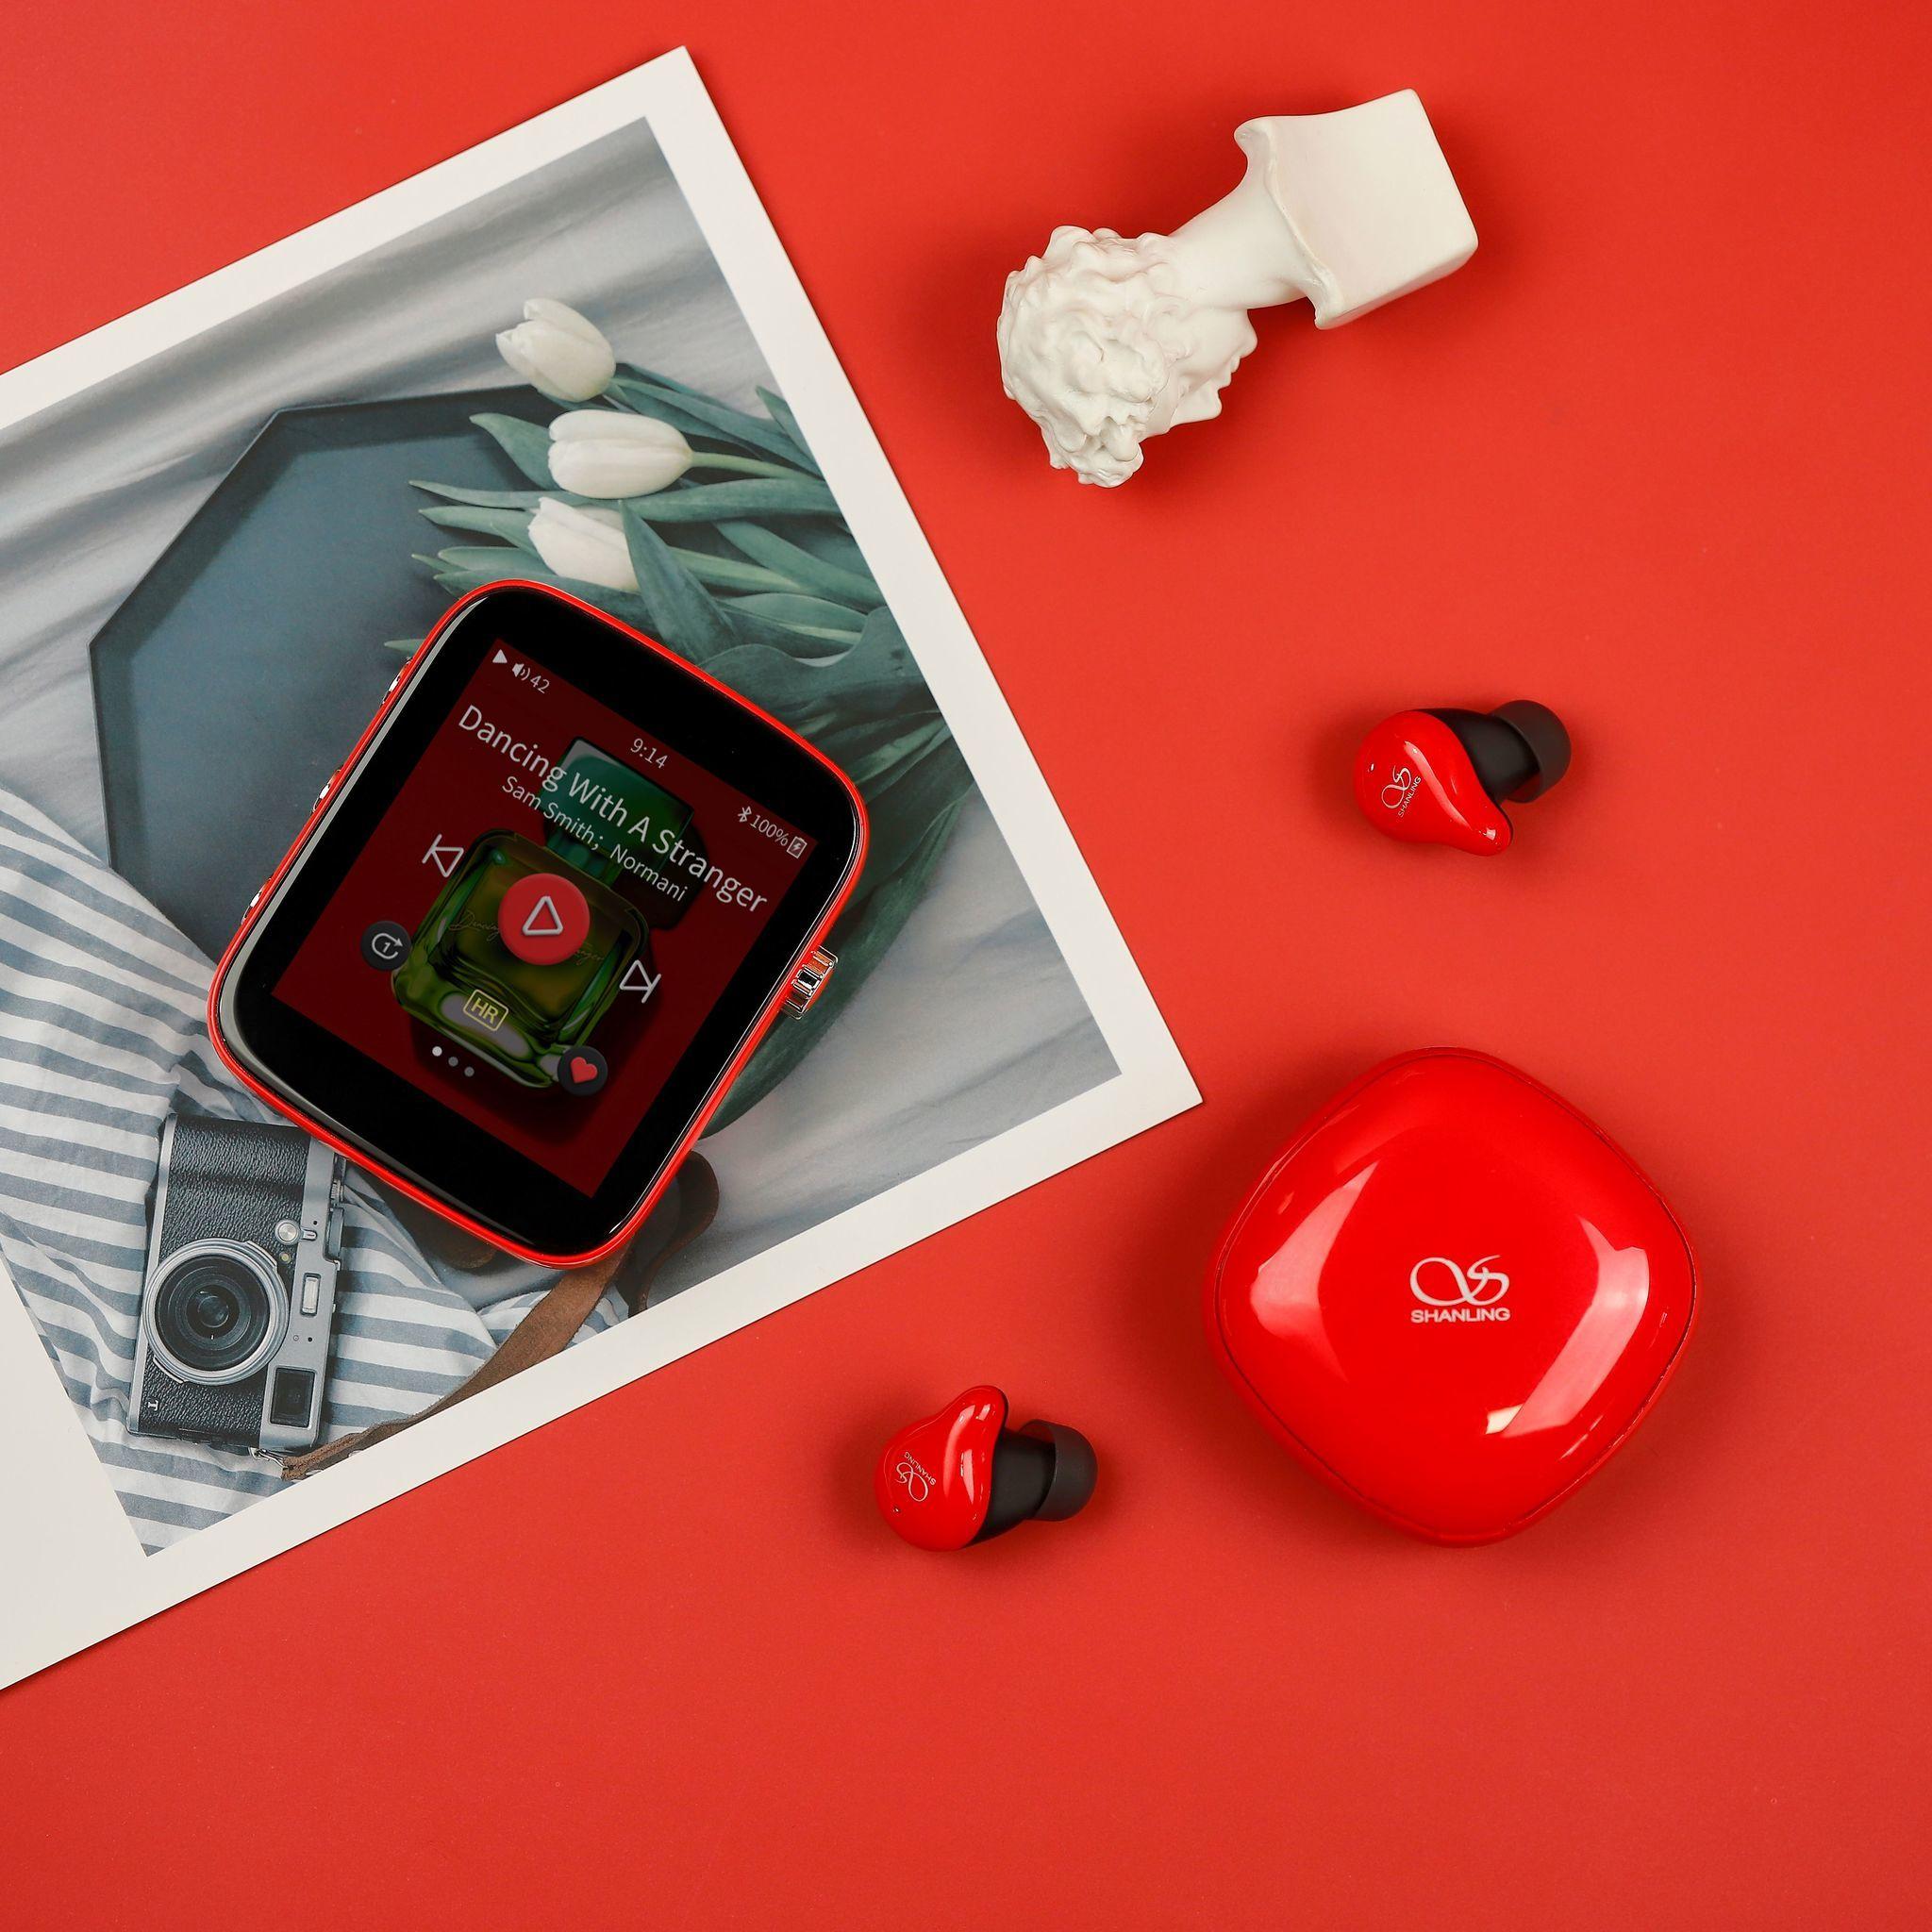 Shanling Q1 fire red, портативный аудиоплеер